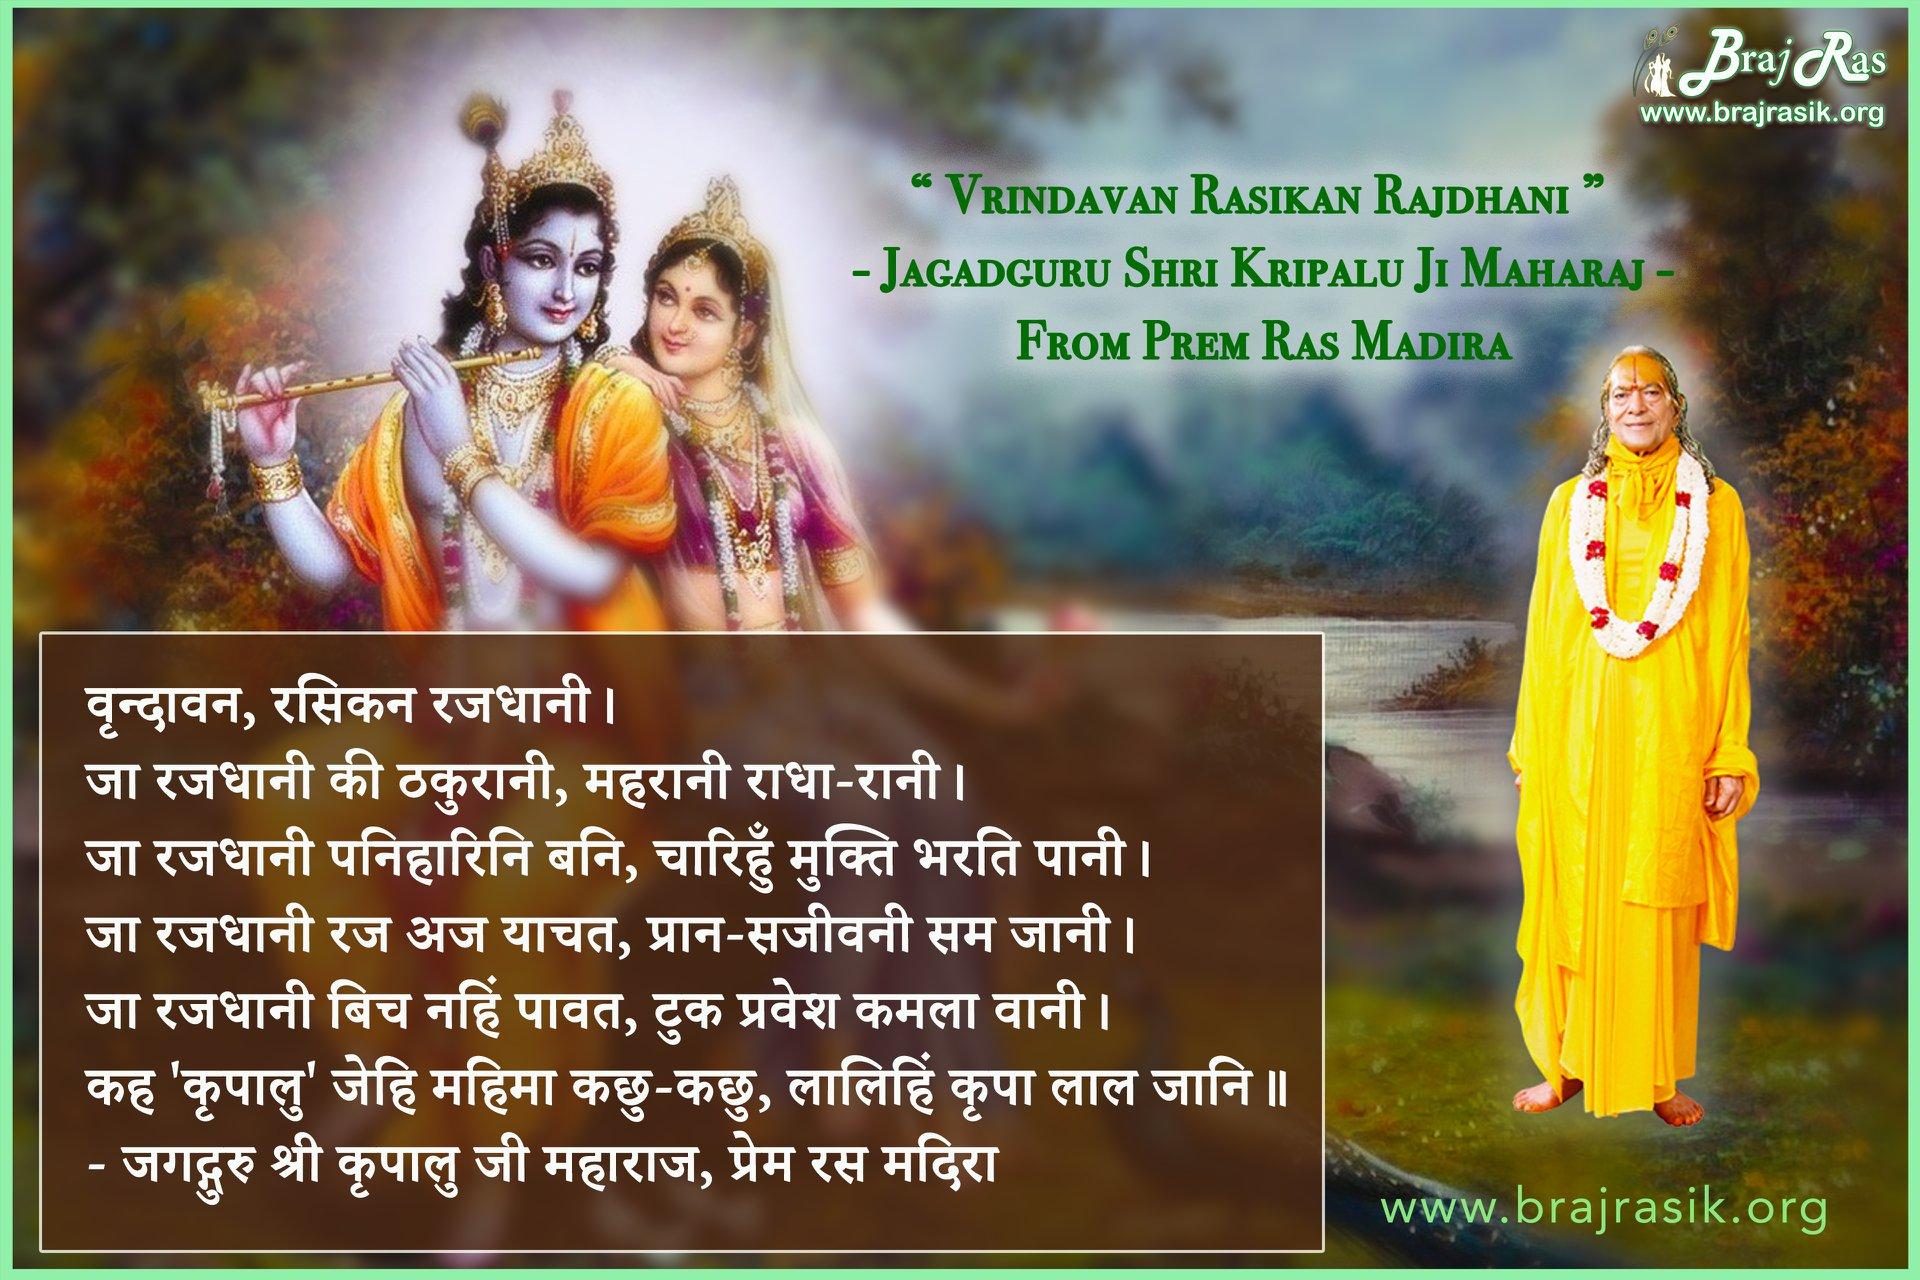 "Vrindavan Rasikan Rajdhani "" - Jagadguru Shri Kripalu Ji Maharaj - From Prem Ras Madira"